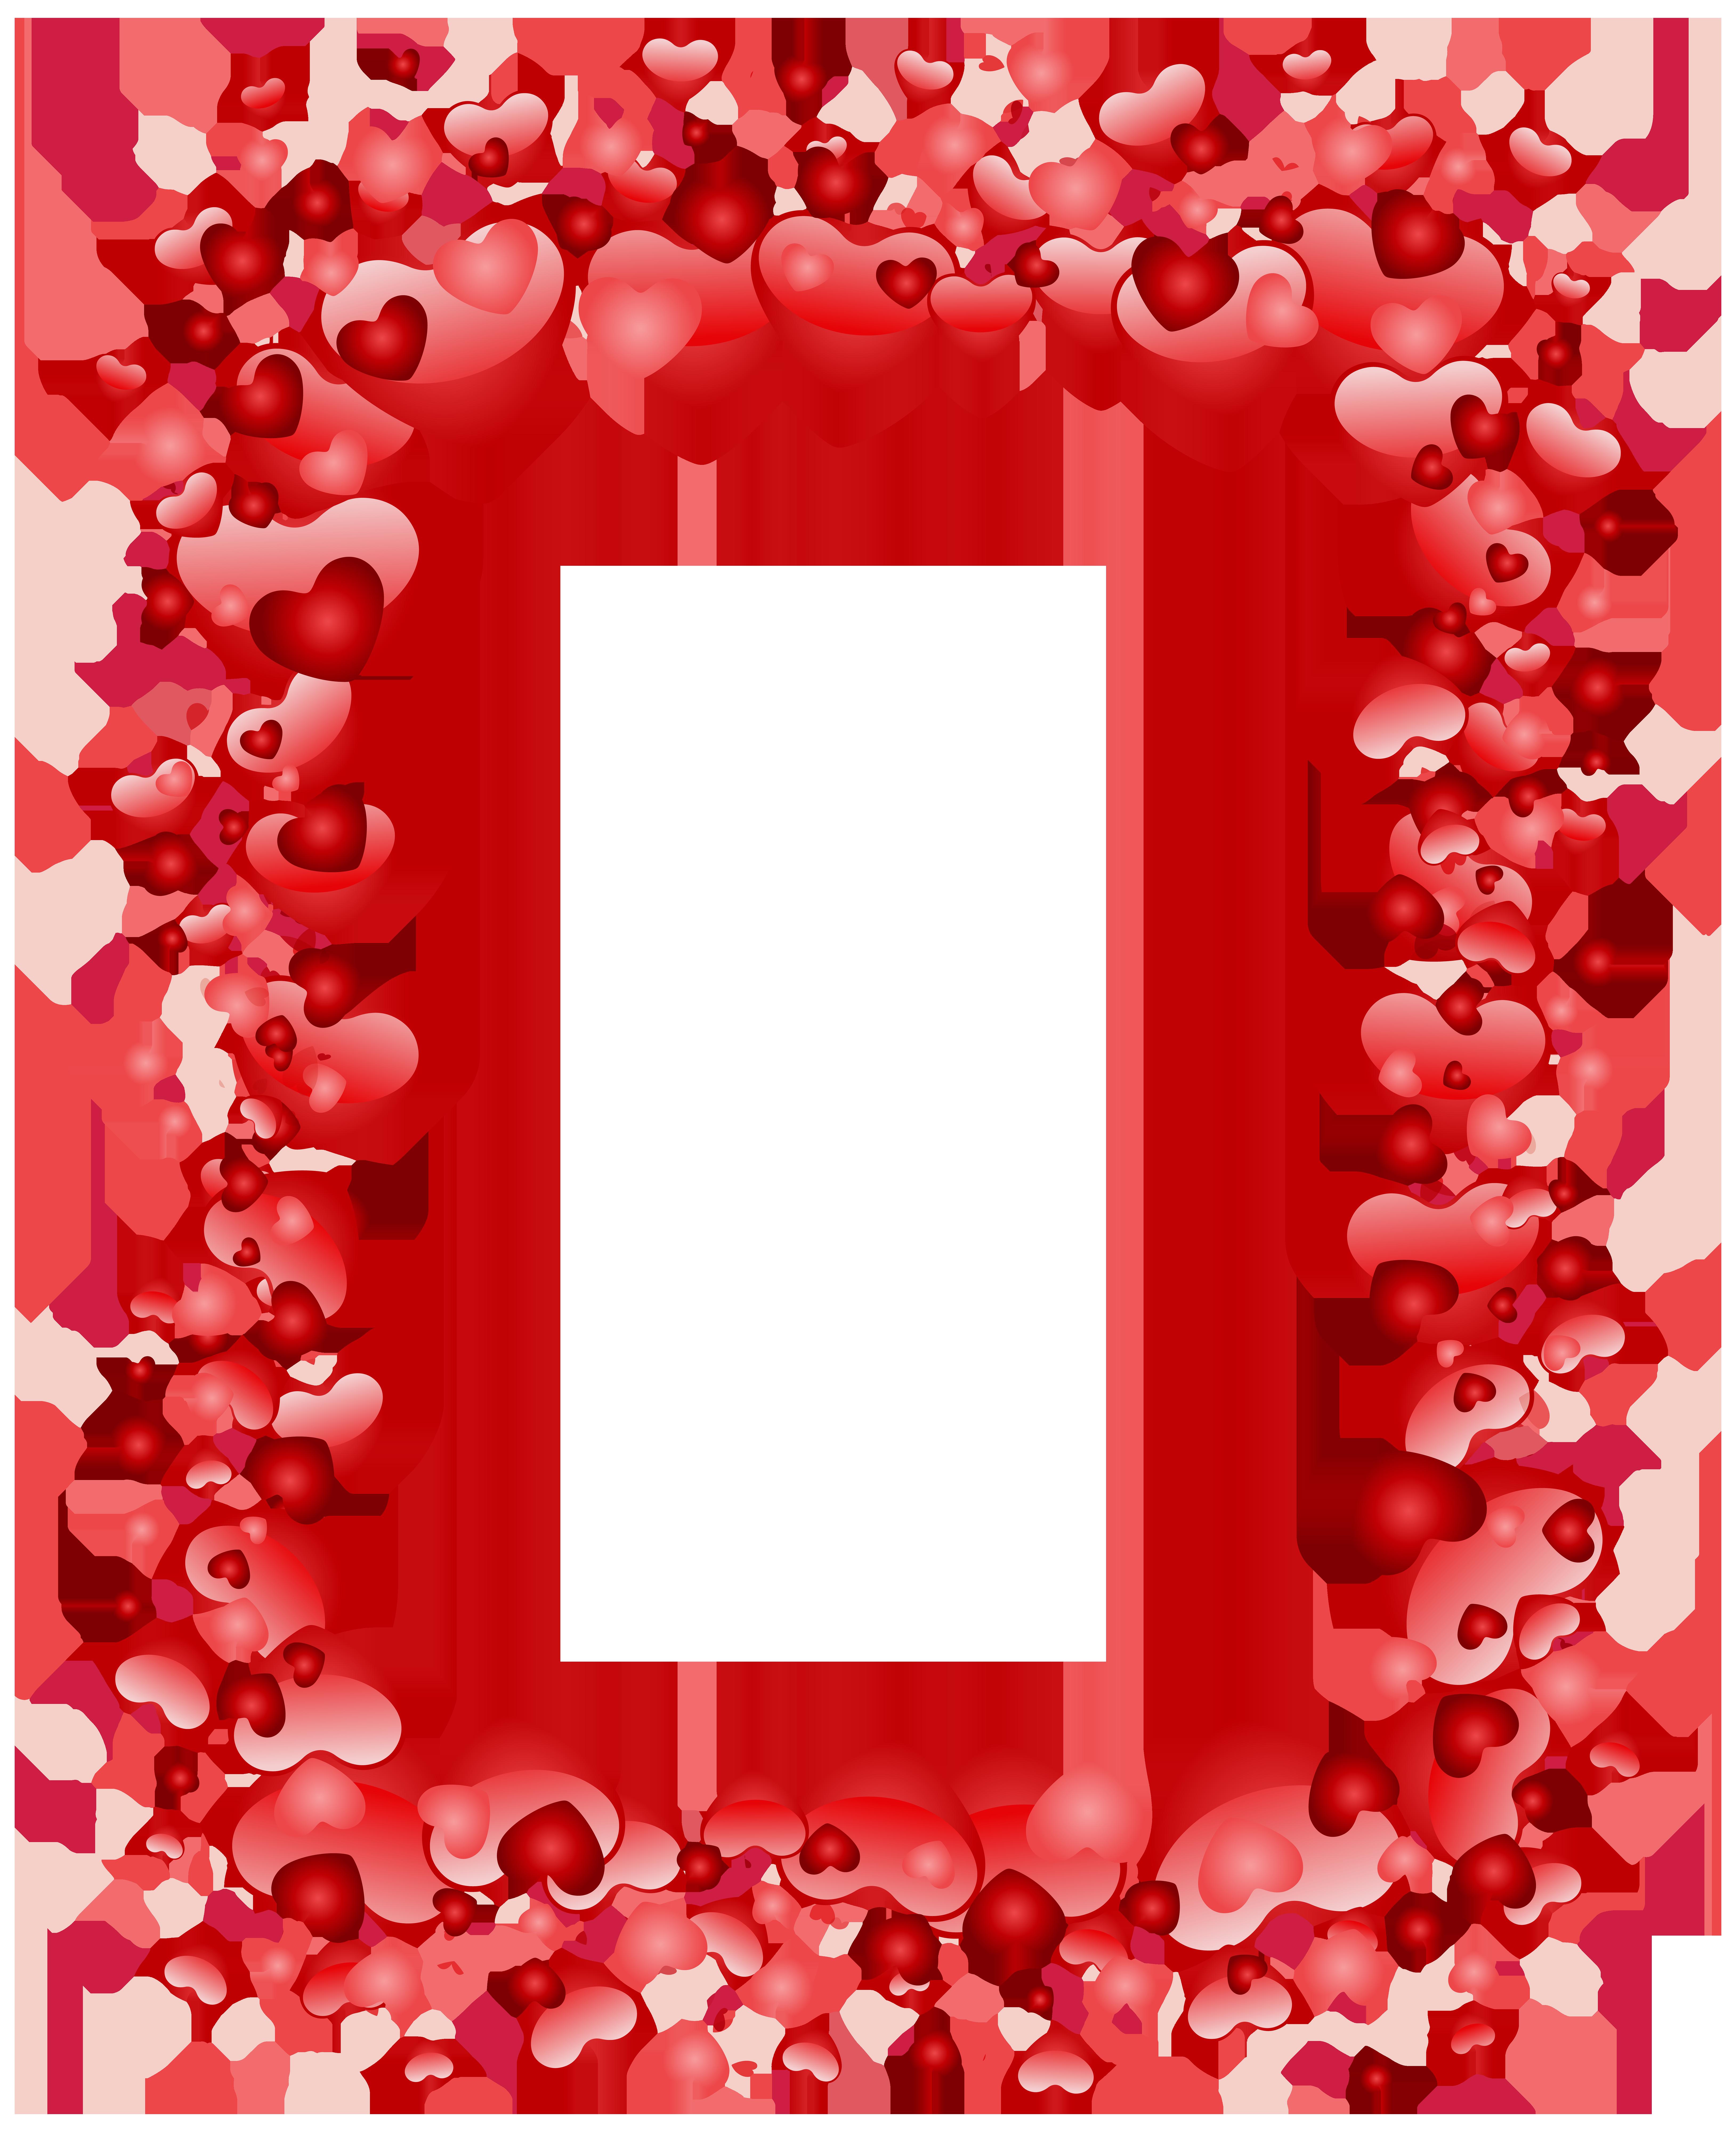 Valentine's Day Hearts Border Transparent PNG Clip Art Image.